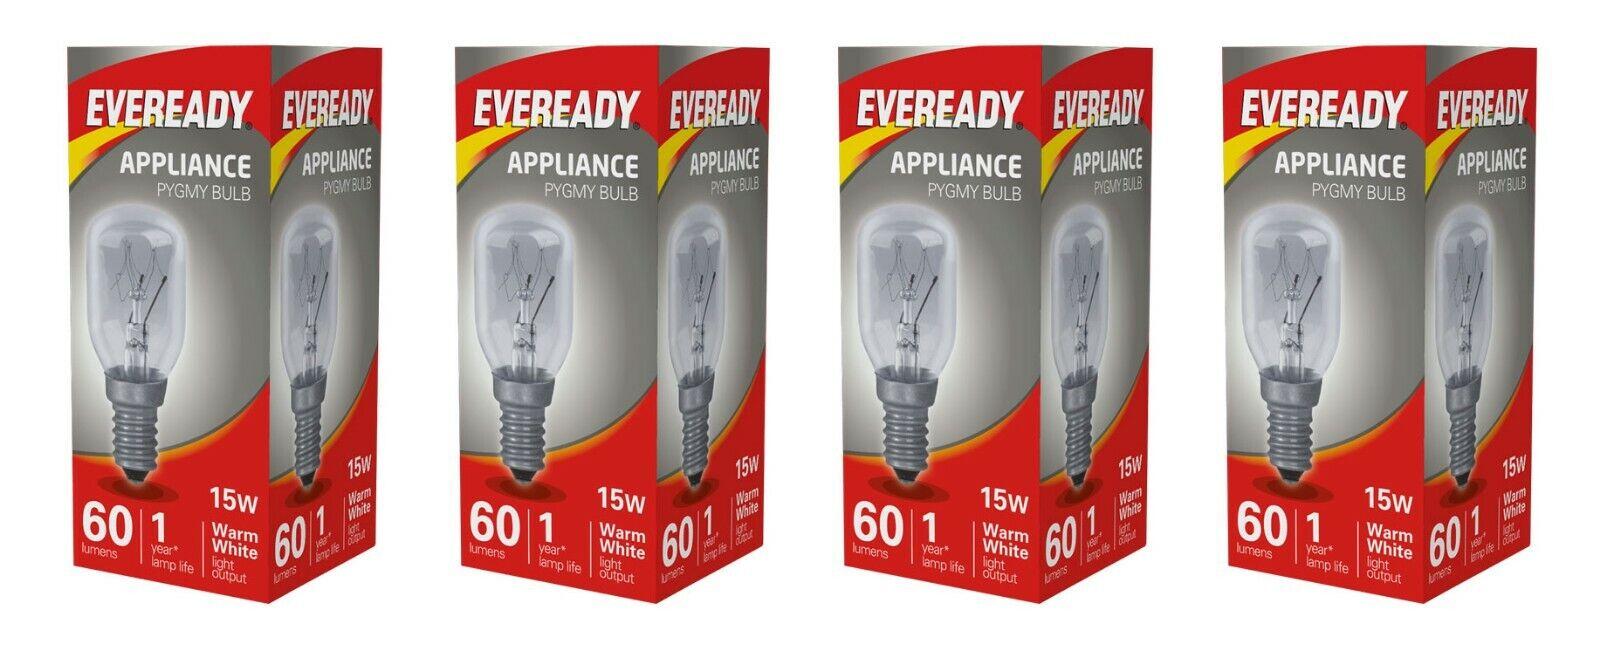 5 X FRIDGE  PIGMY LAMP LIGHT BULBS 25W E14 SMALL SCREW CAP CLEAR BULBS